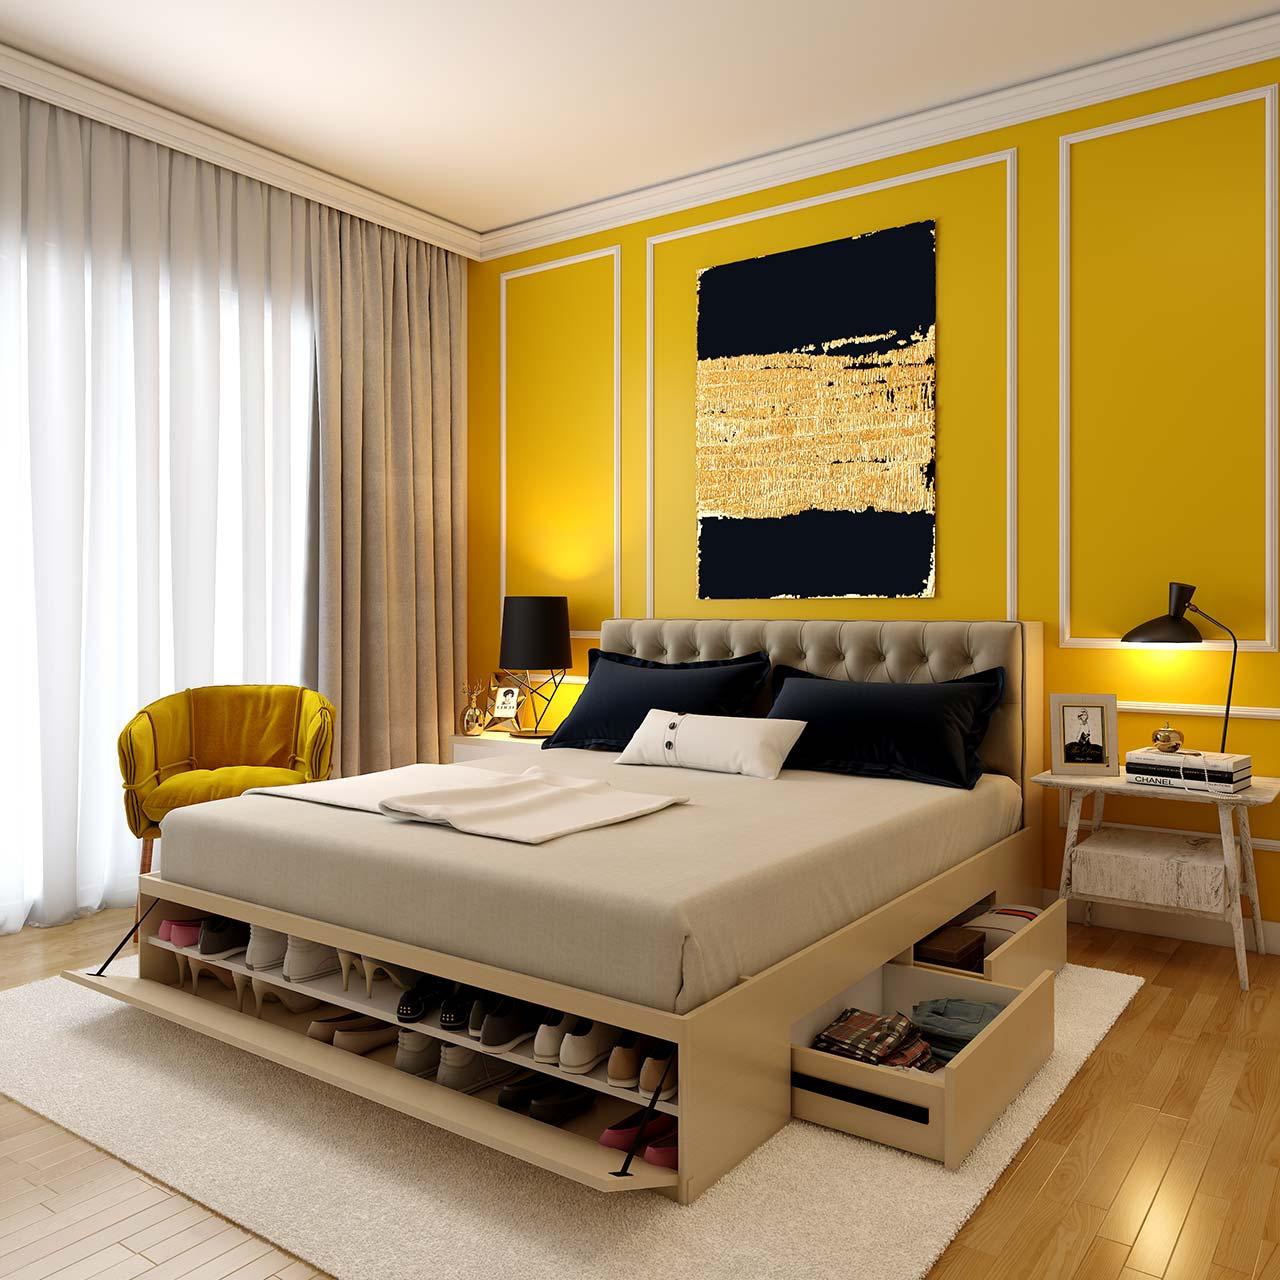 Build Storage into Design for Master Bedroom